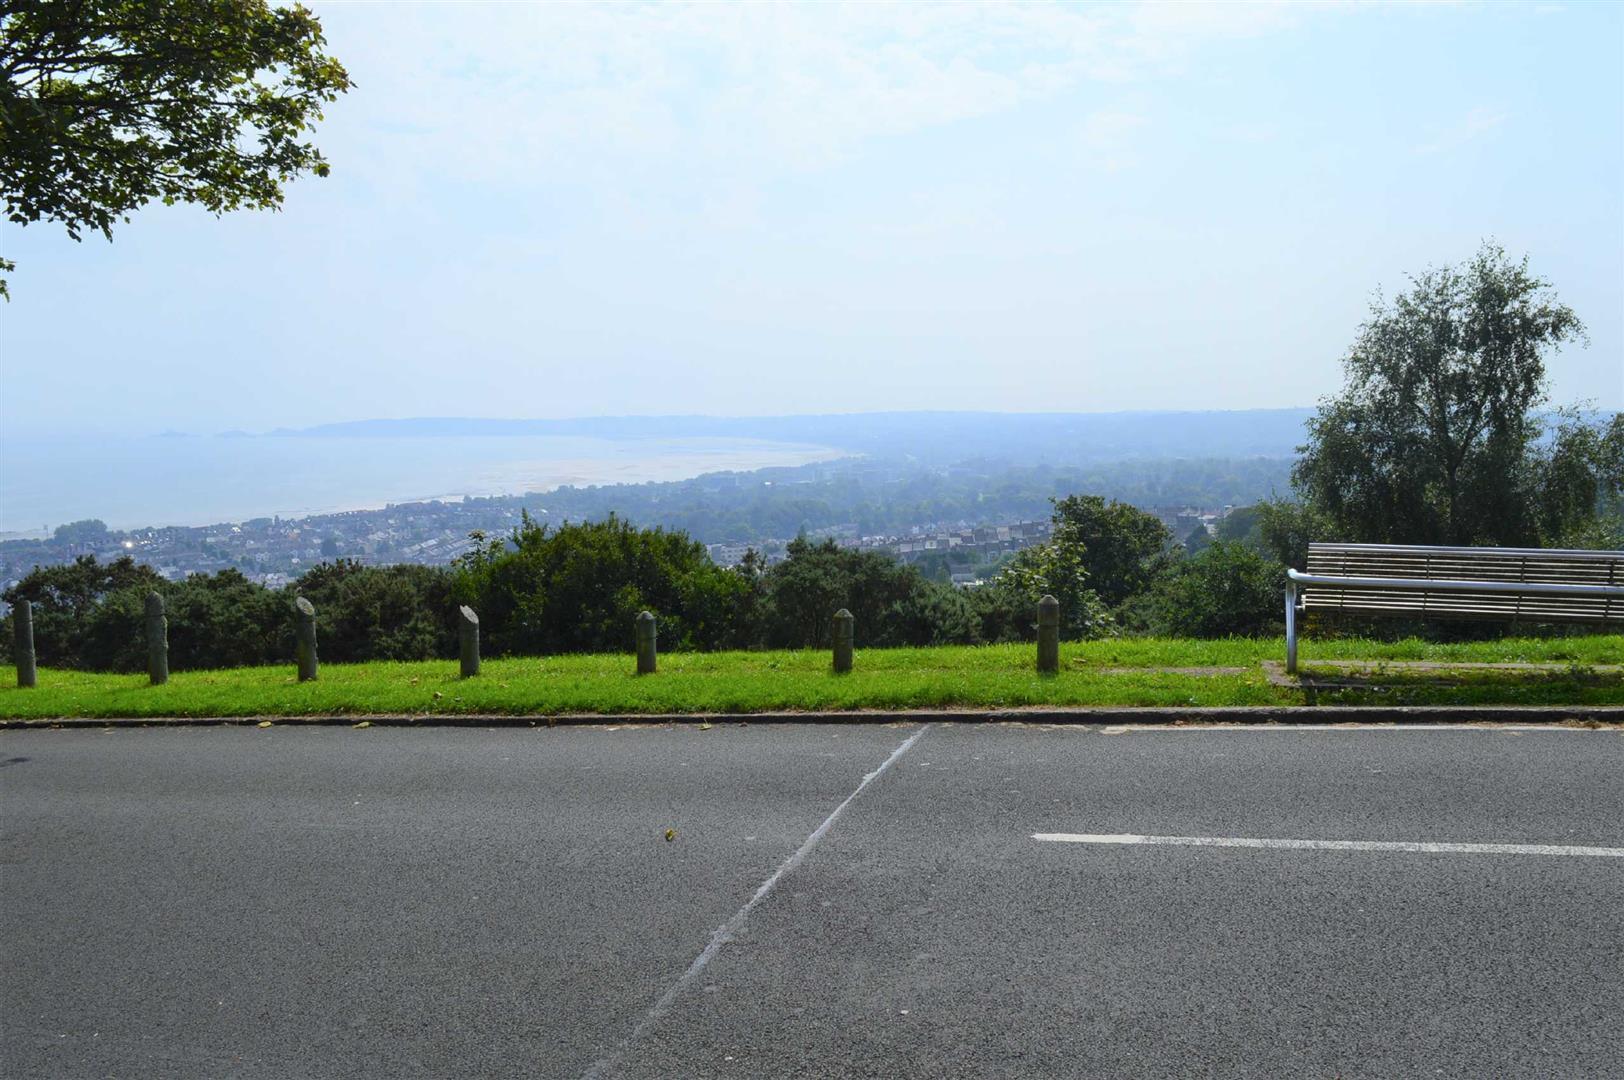 Pantycelyn Road, Townhill, Swansea, SA1 6NB